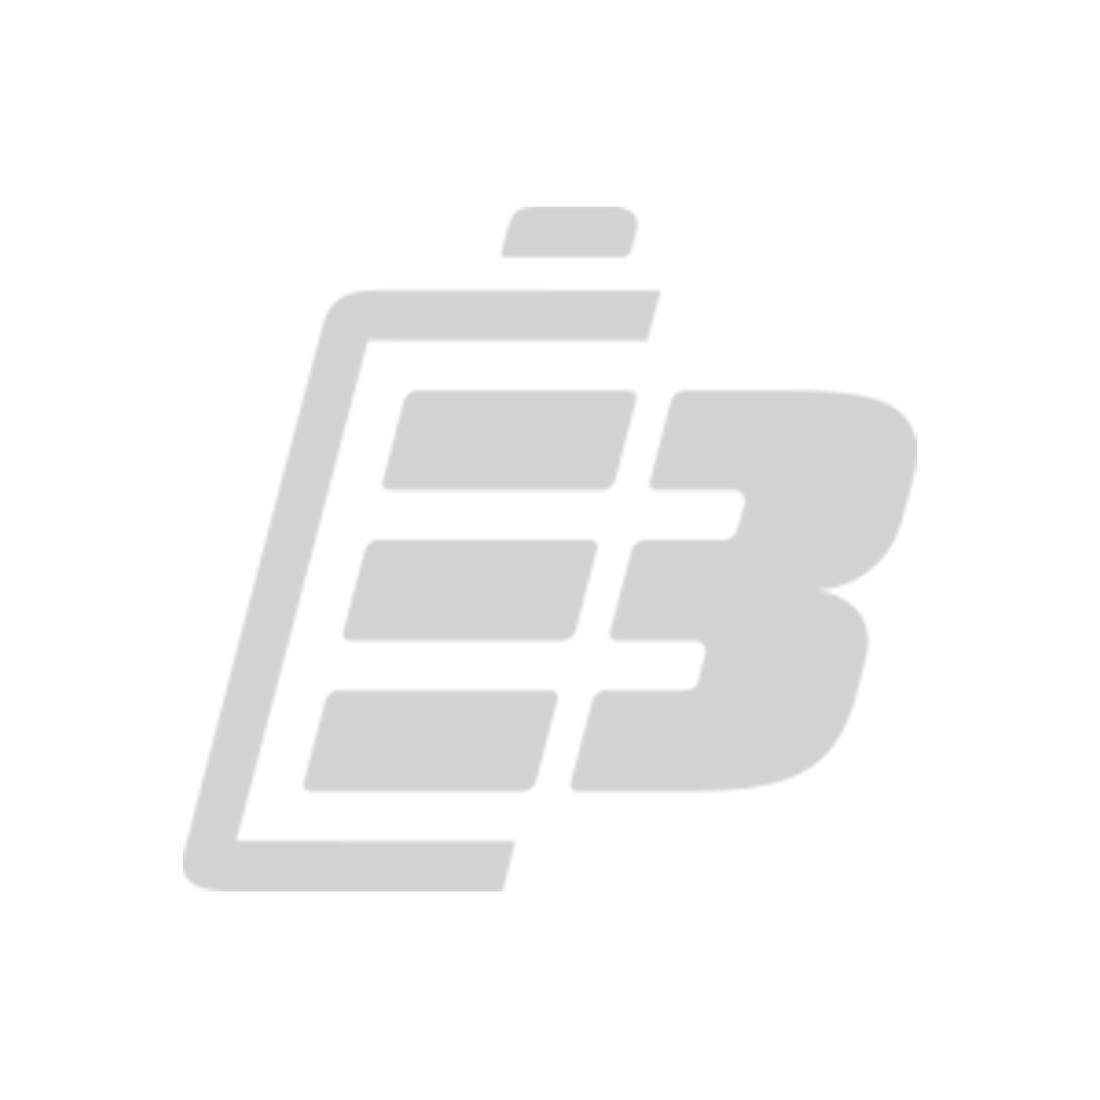 Smartphone battery Huawei P8_1